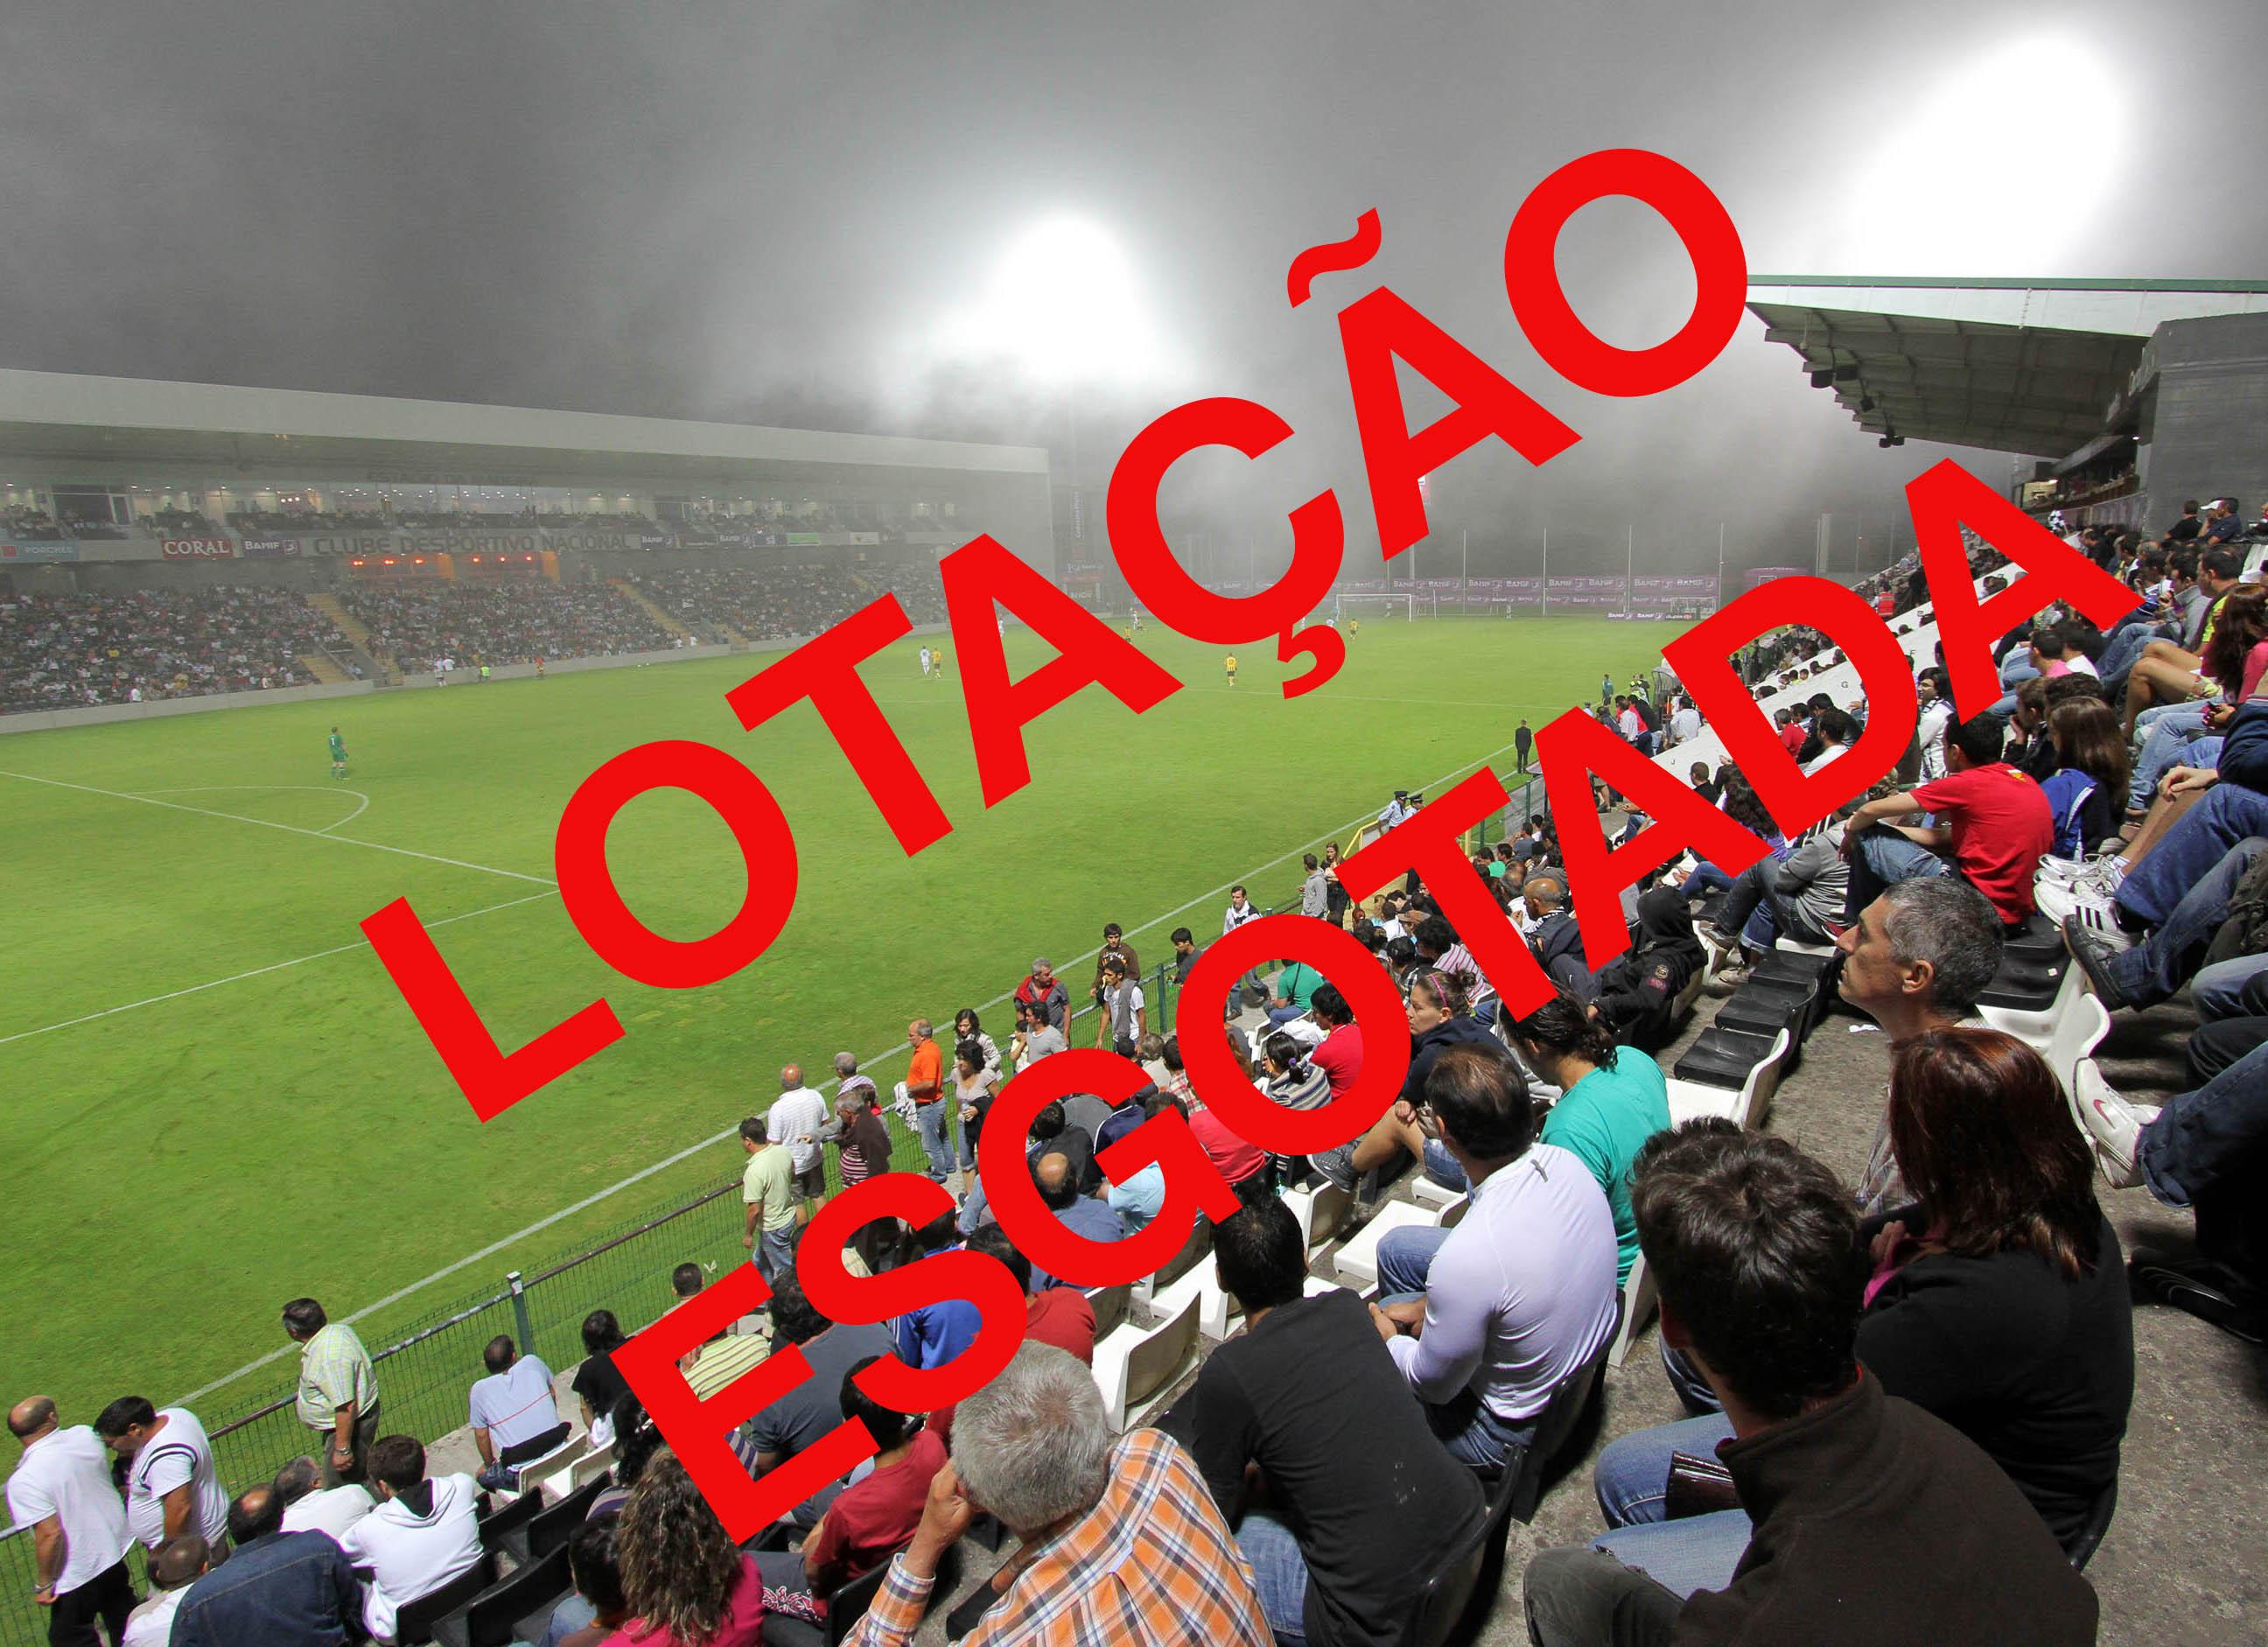 Nacional Benfica: Clube Desportivo Nacional Liga NOS: Nacional-Benfica Com